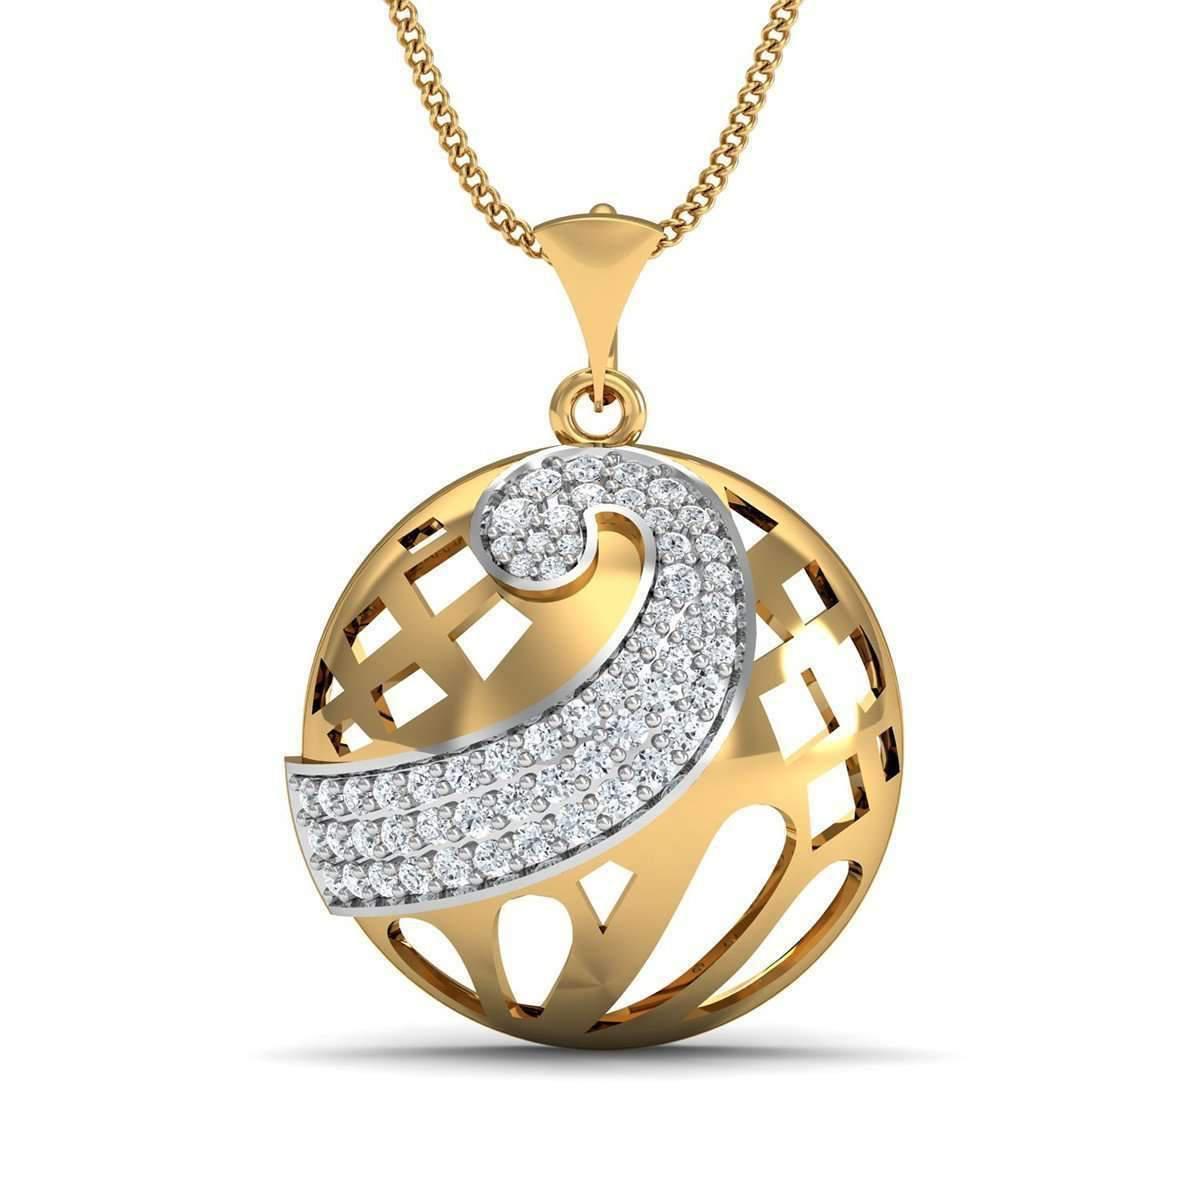 Diamoire Jewels Emblematic 18Kt Yellow Gold Diamond Pave Pendant RqUdUN